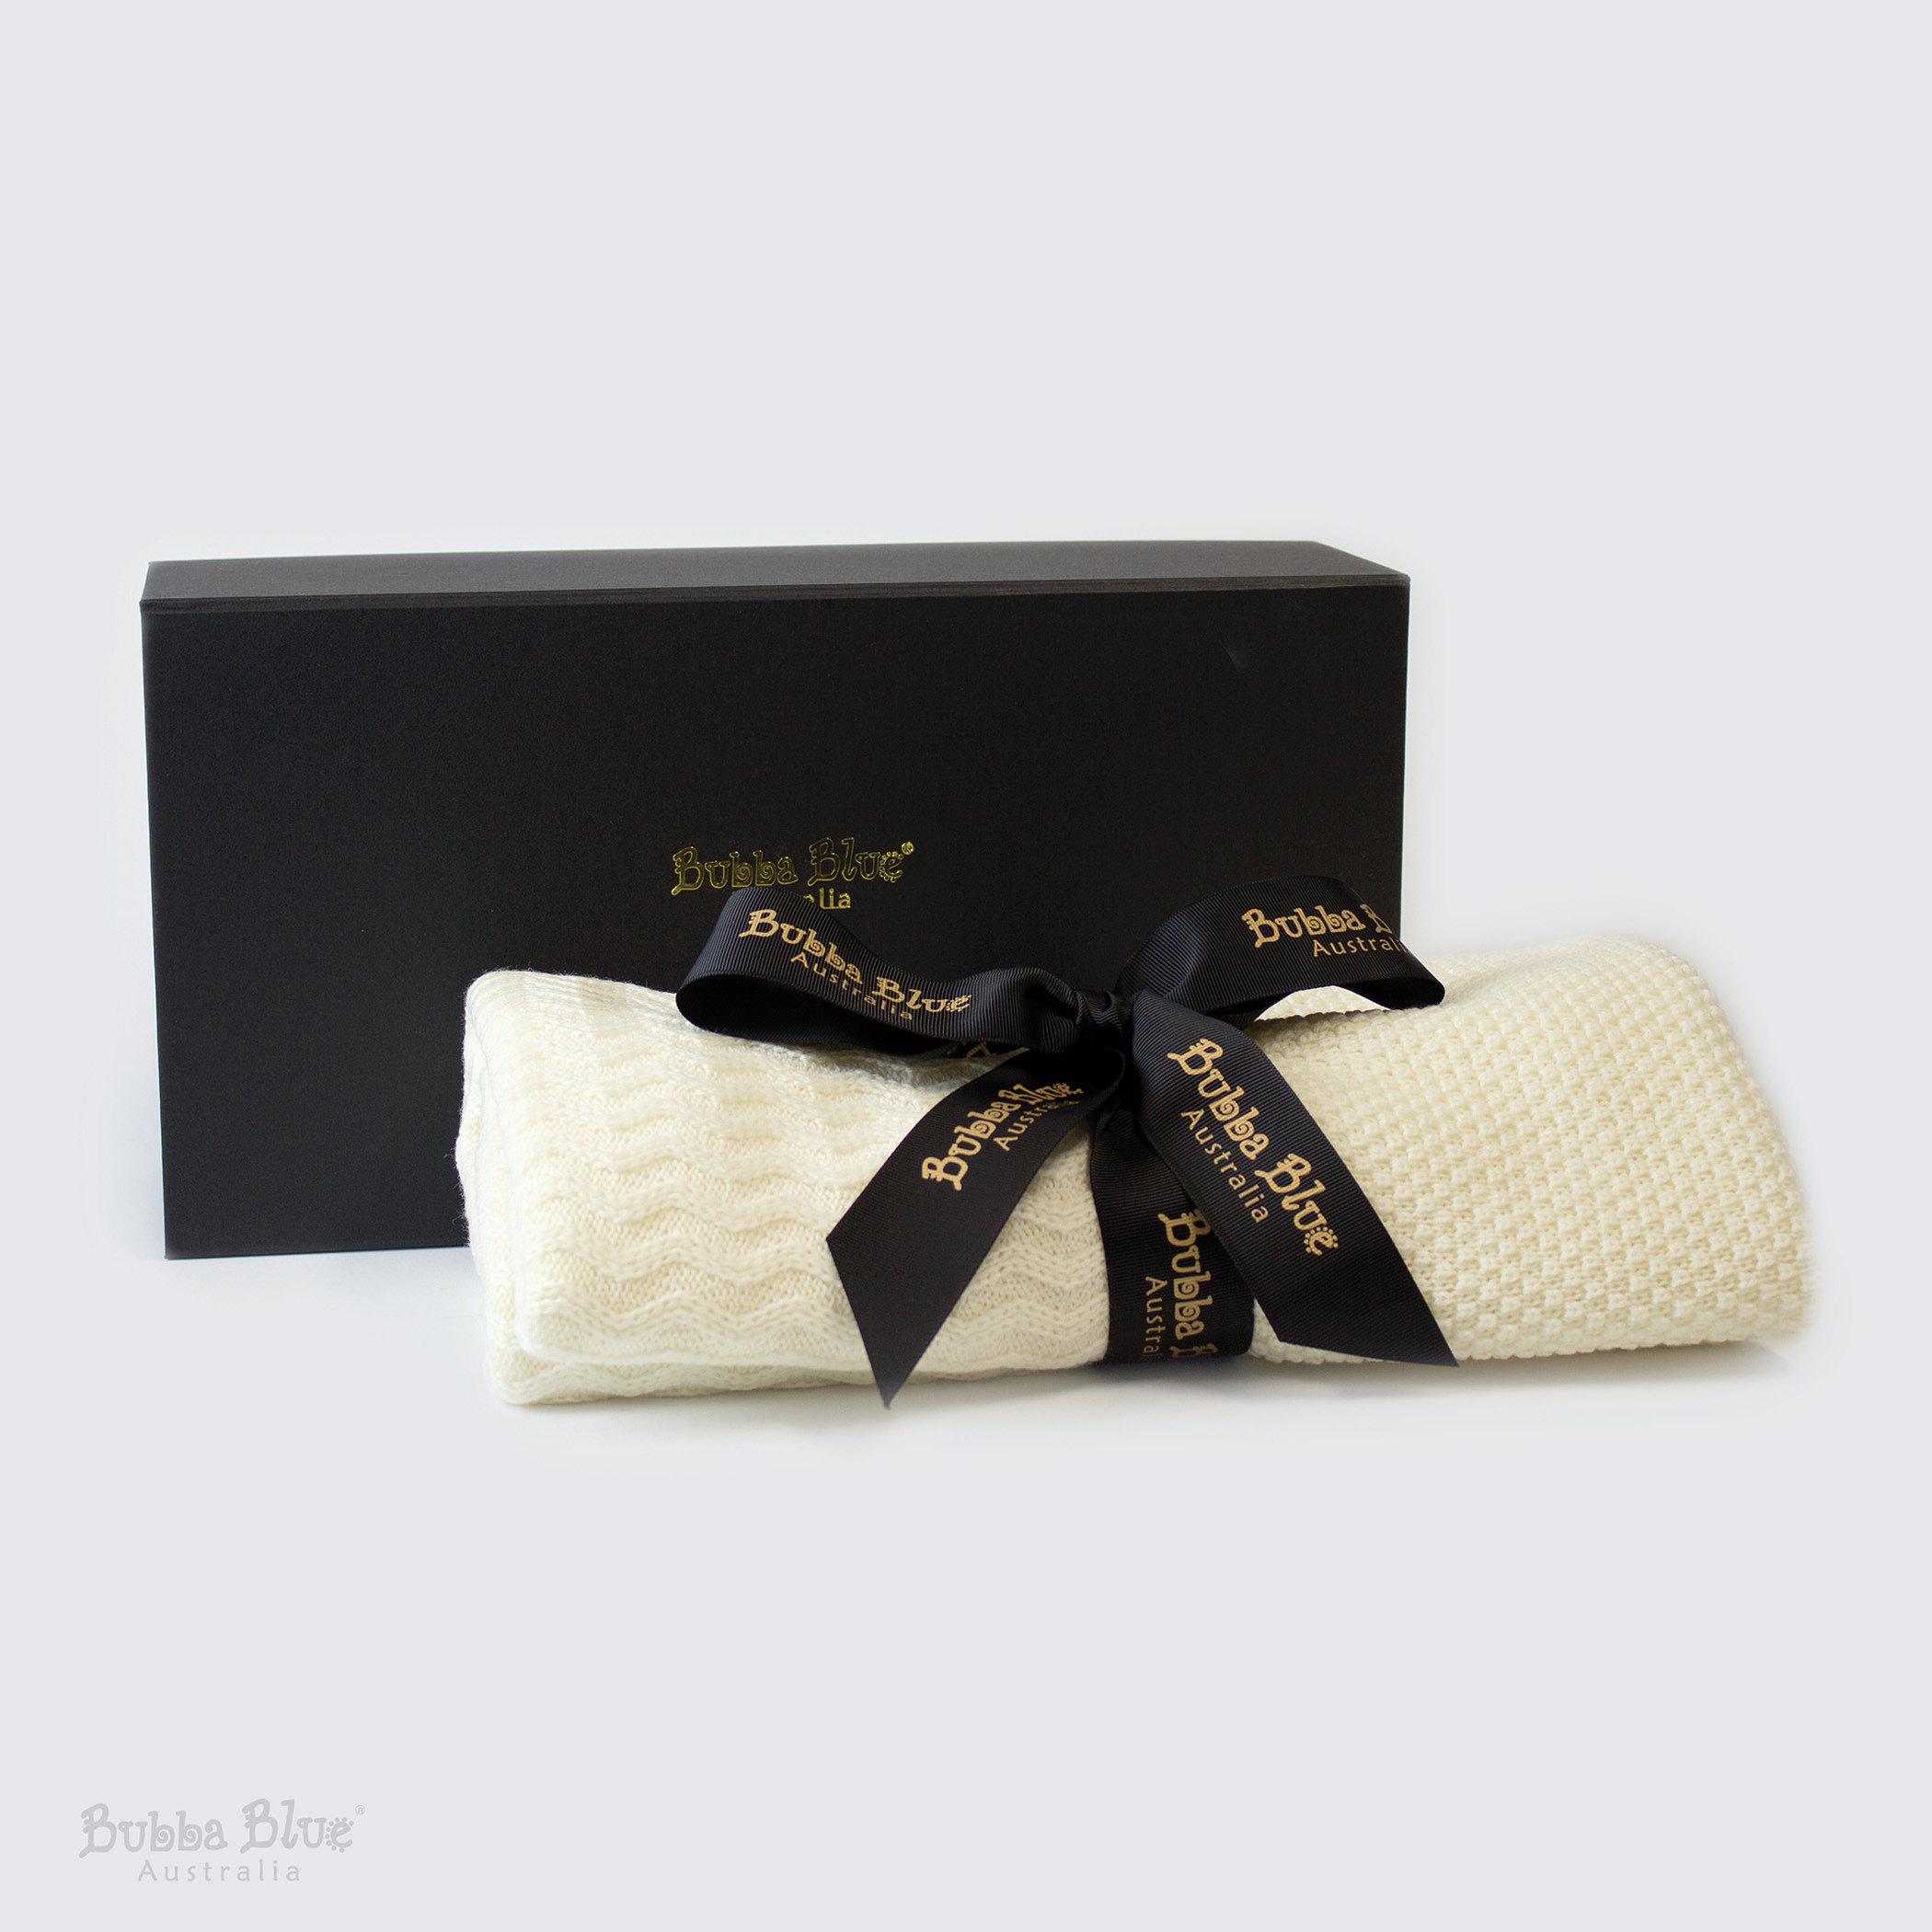 Gift Ideas for a Royal Baby - Bubba Blue Merino Wool Blanket.jpg